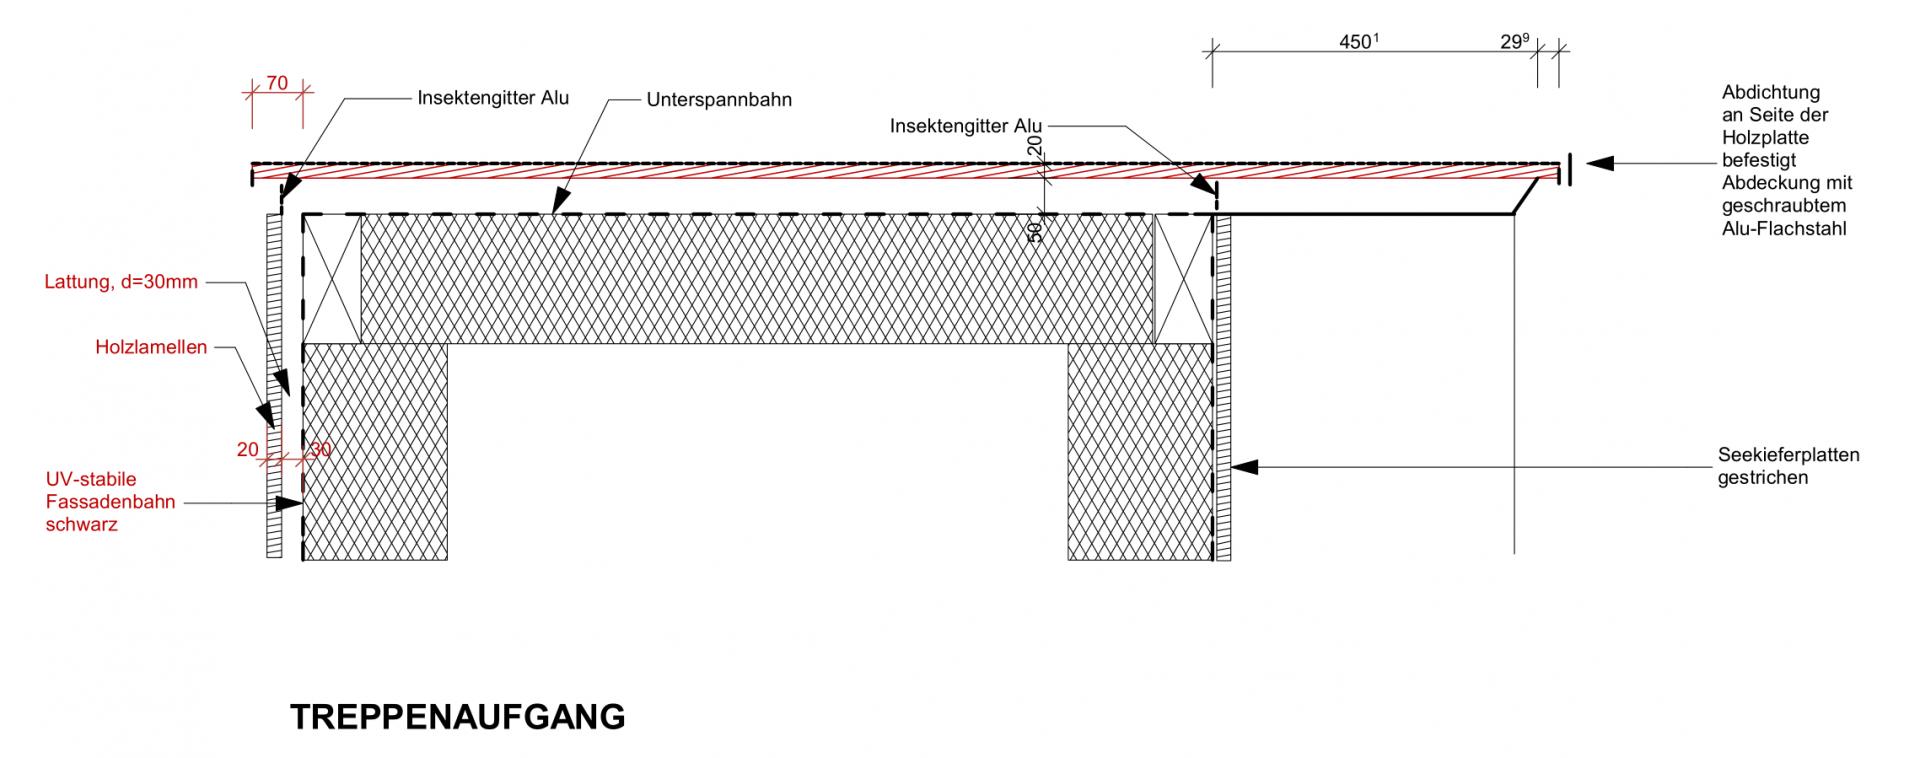 Treppenaufgang Detailplan